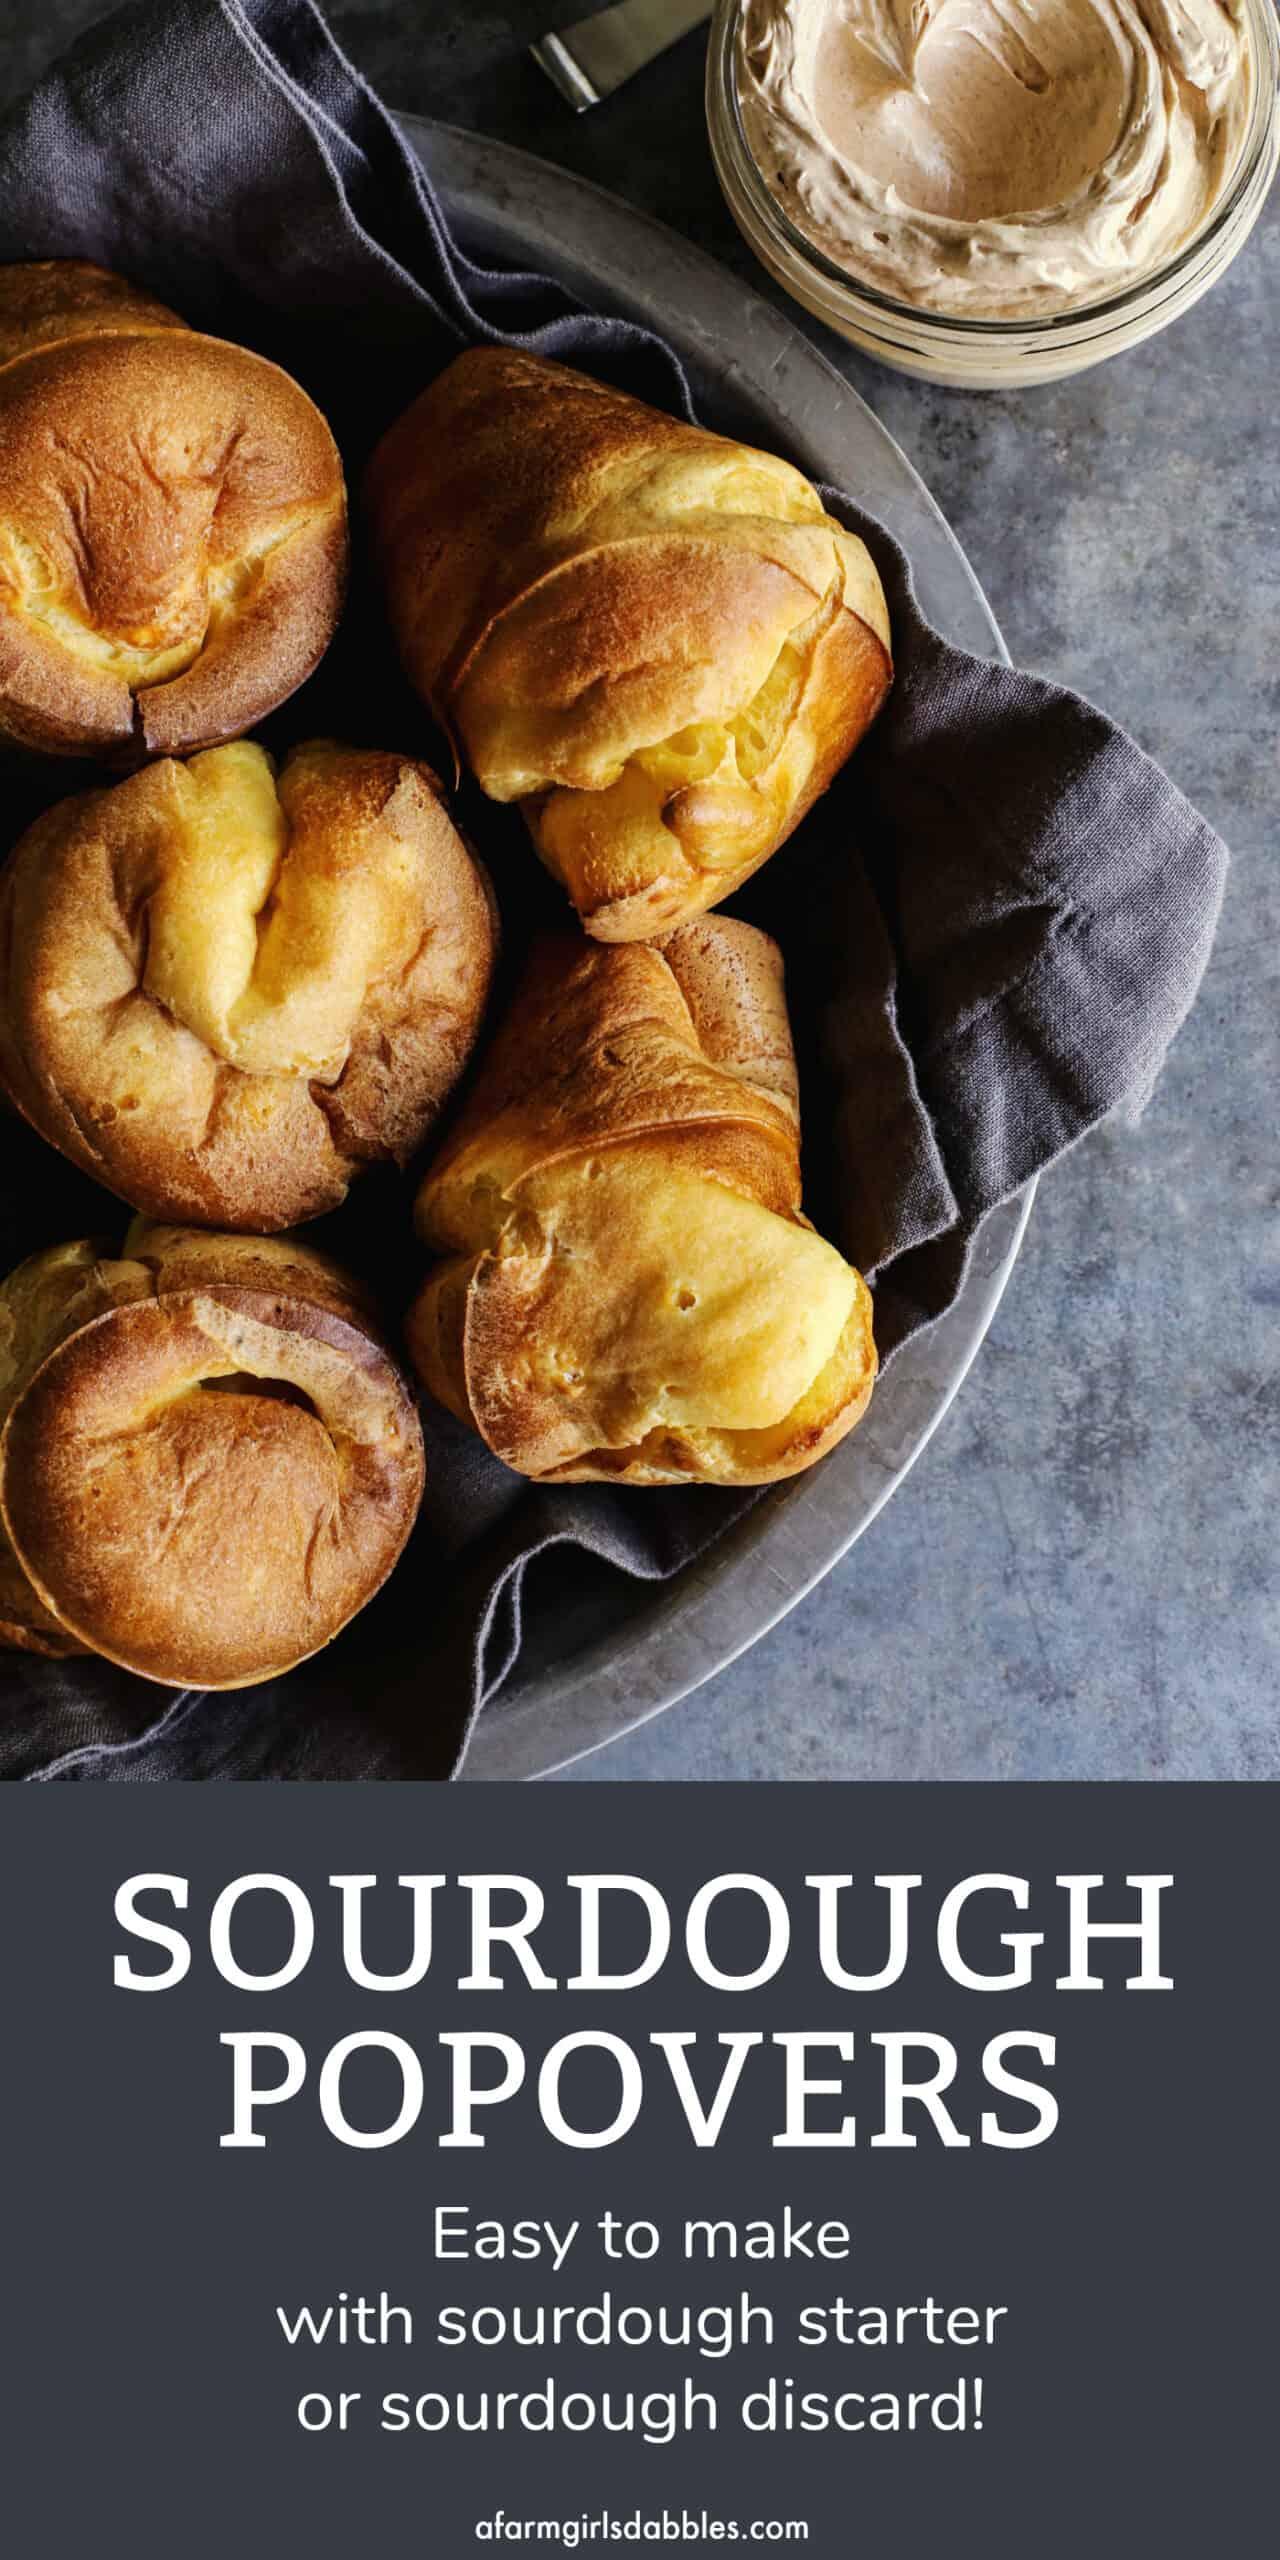 Pinterest image for sourdough popovers